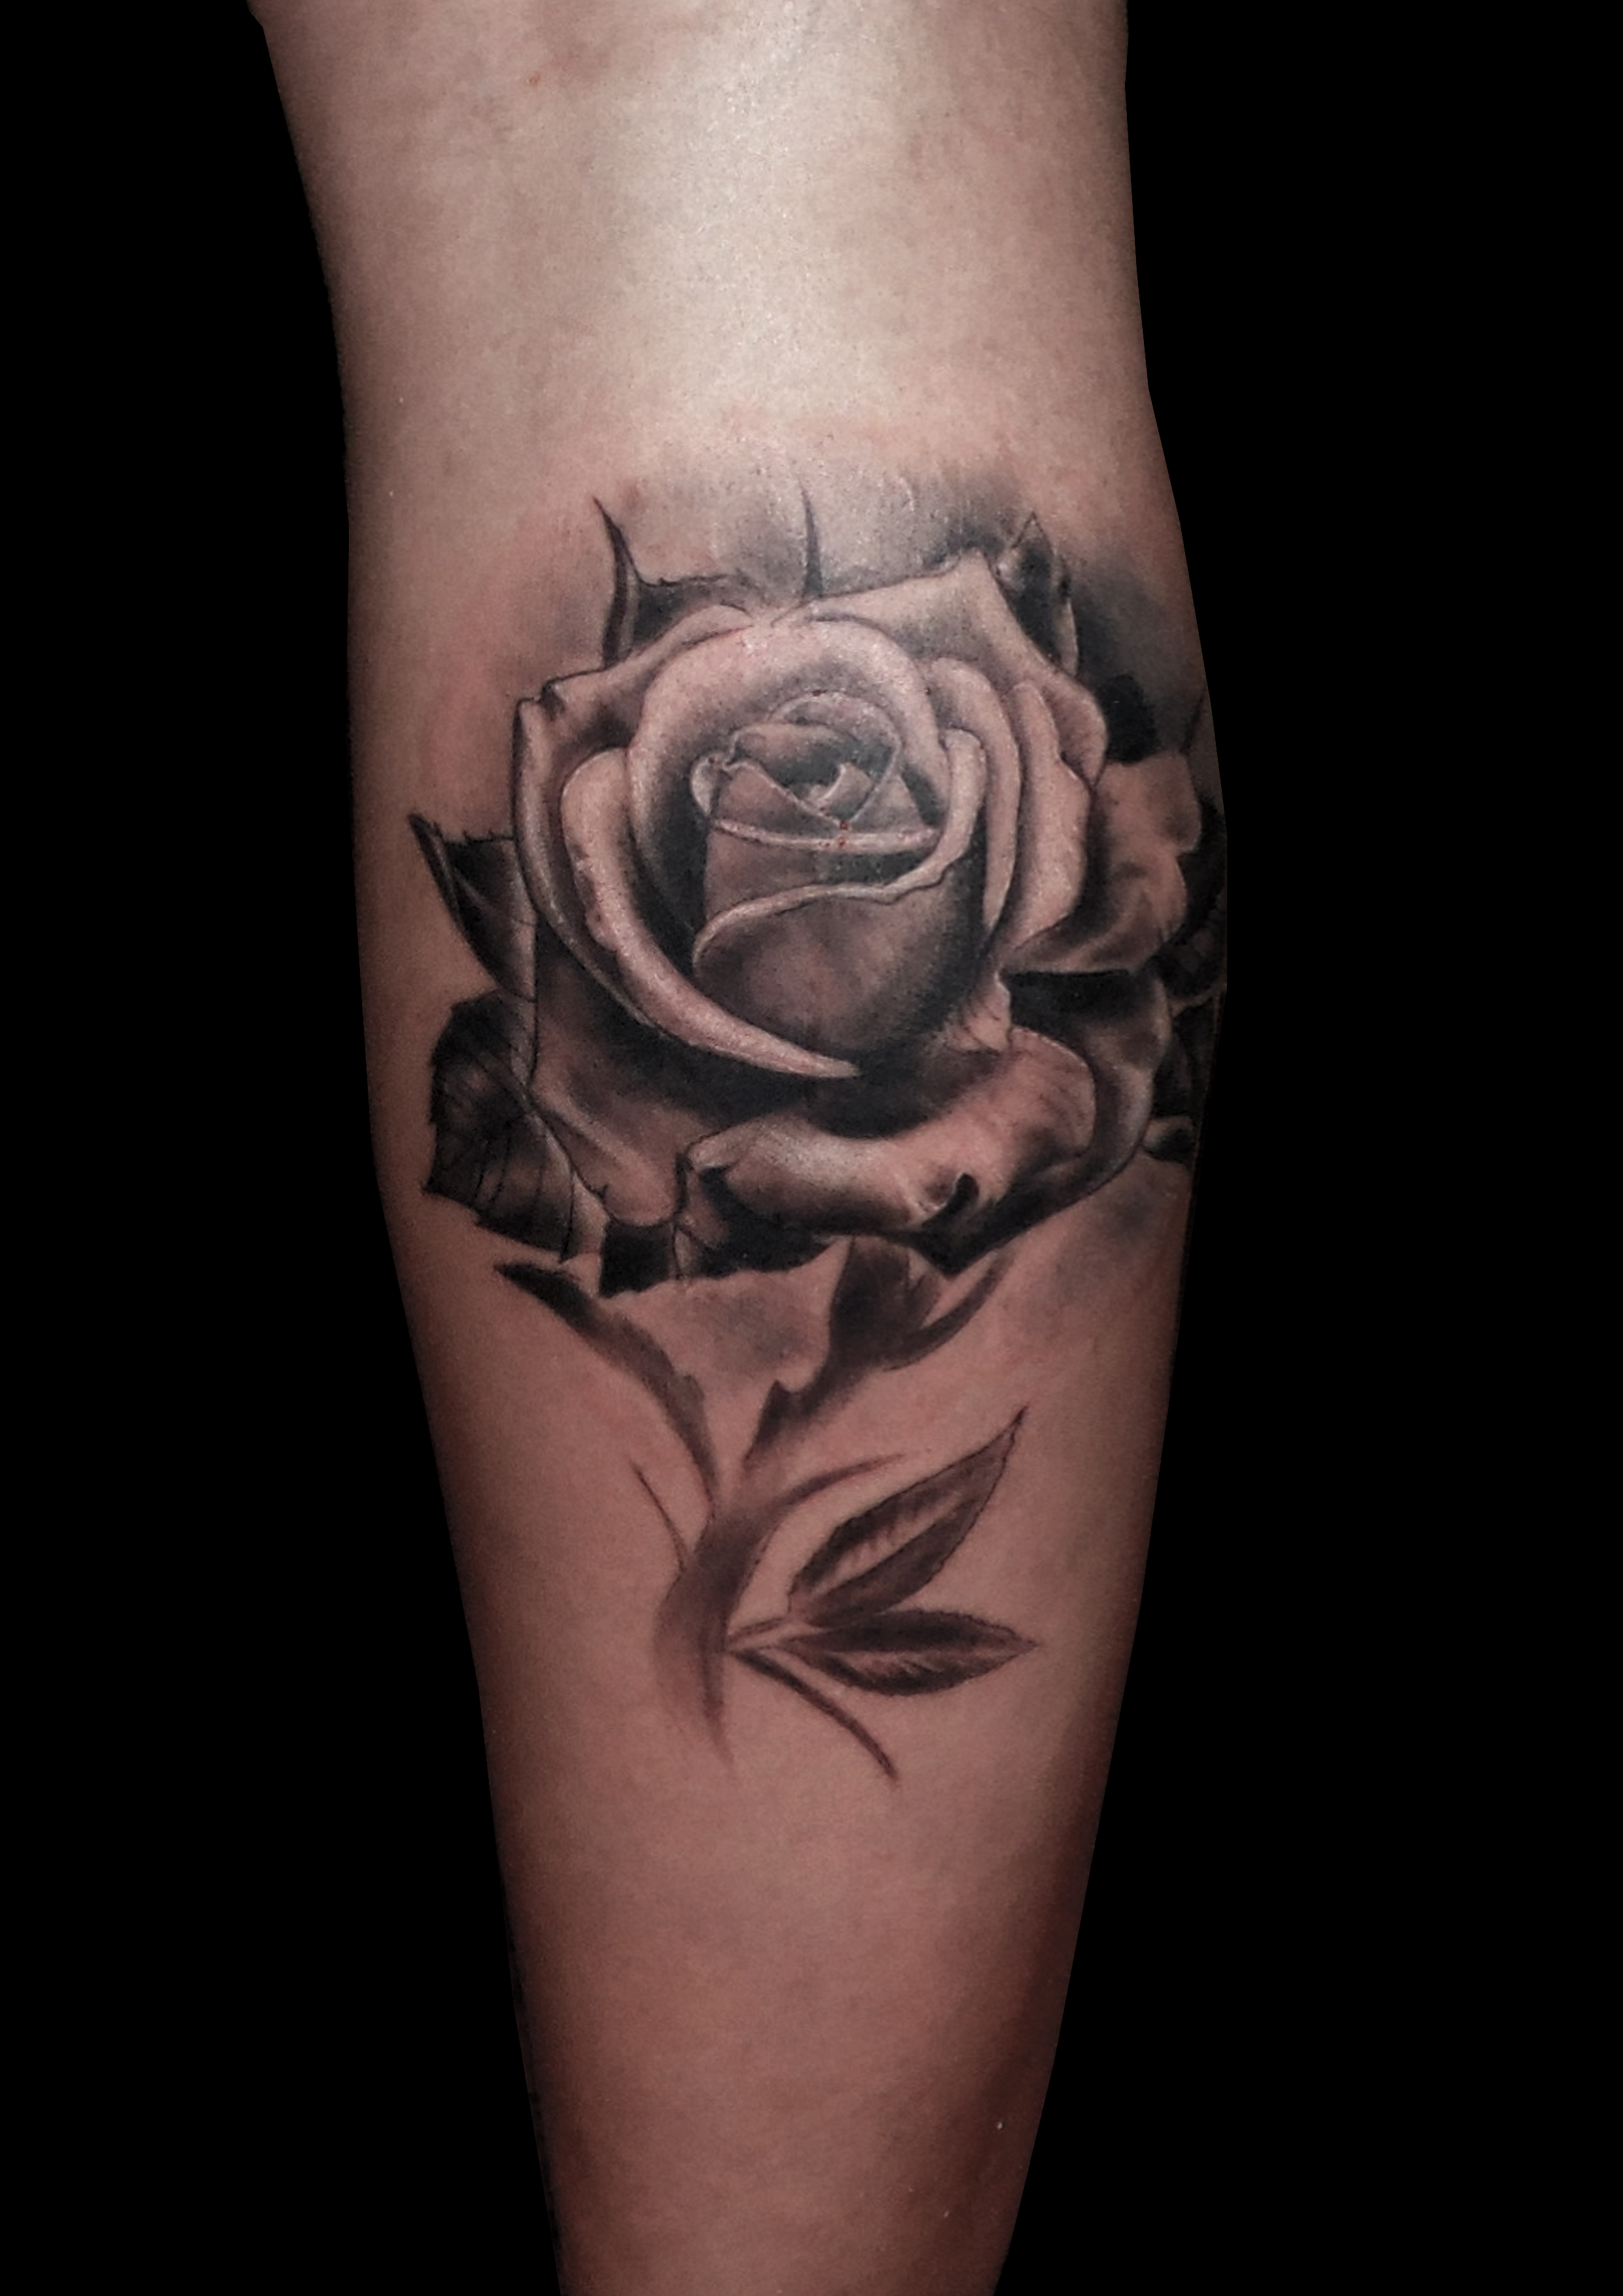 Galeria Tatuajes Noviembre 13depicascomstudio Tattoopiercing - Tattoo-gemelos